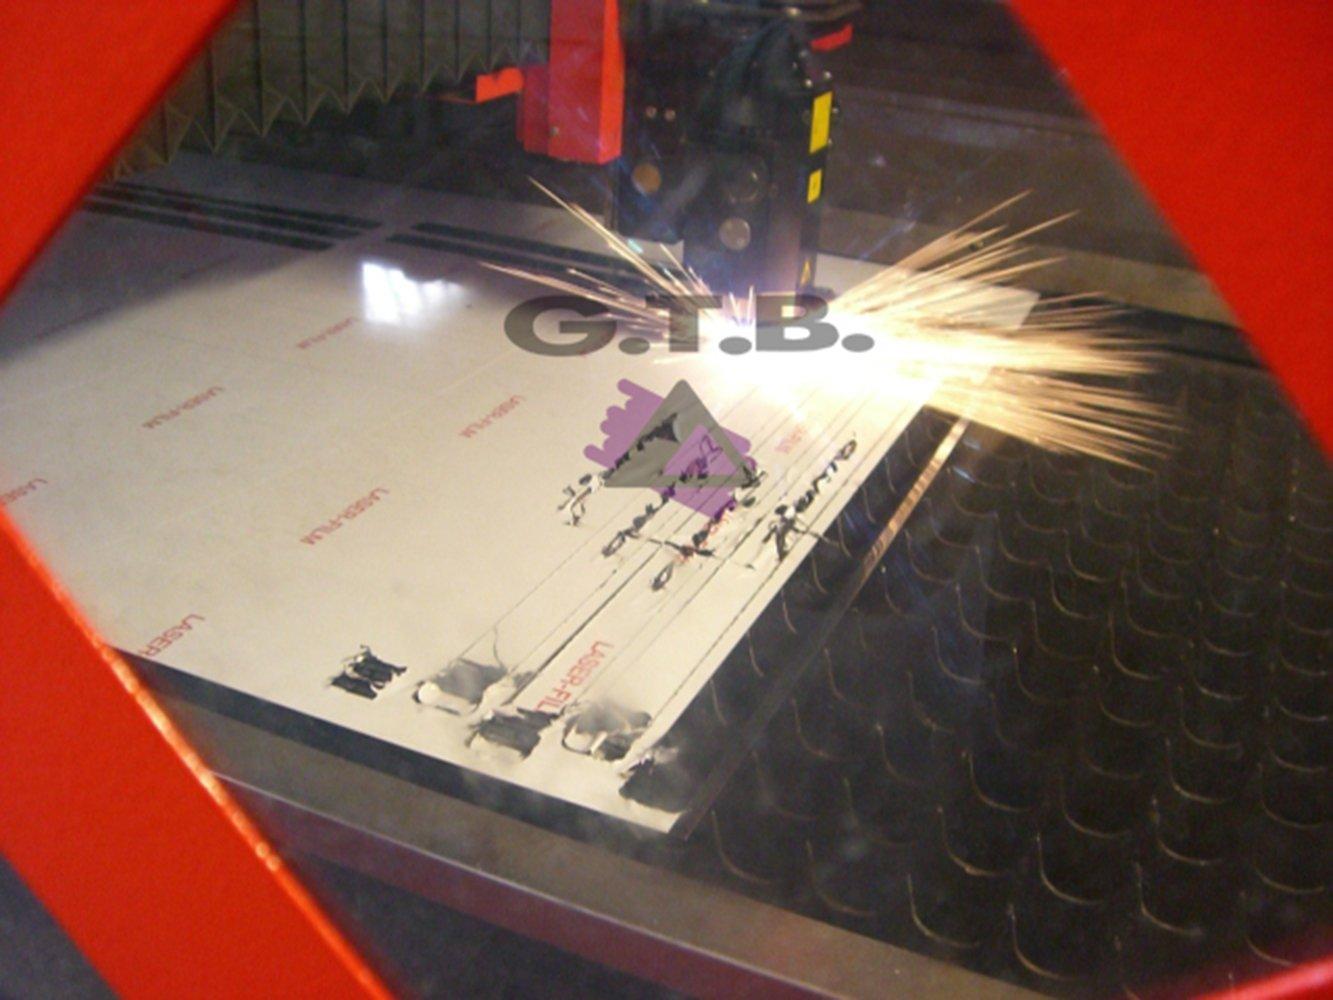 kit tuning pedana poggiapiede acciaio inox 18 x 8 cm con kit velcro incluso